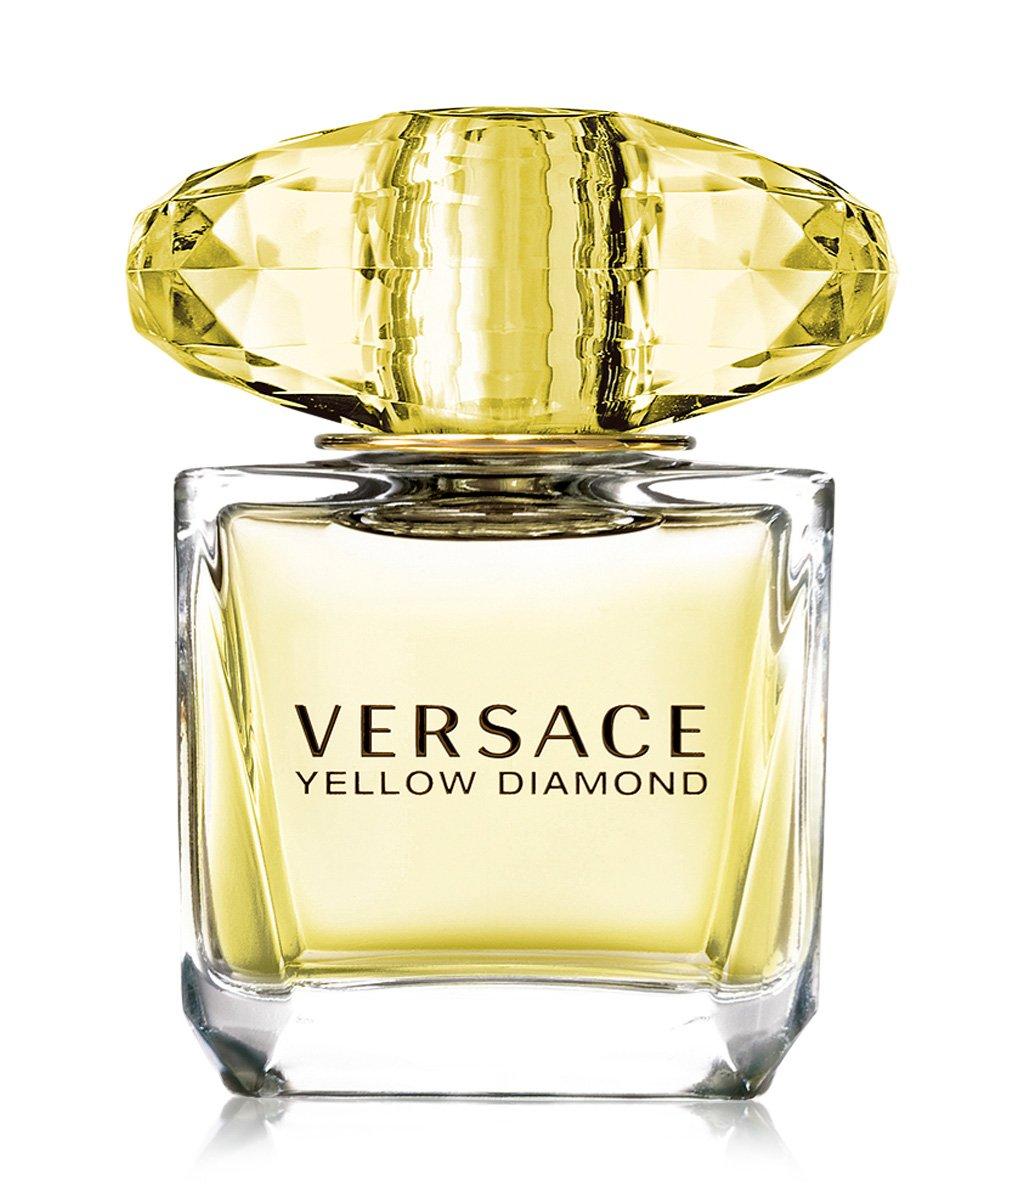 versace yellow diamond online bestellen flaconi. Black Bedroom Furniture Sets. Home Design Ideas